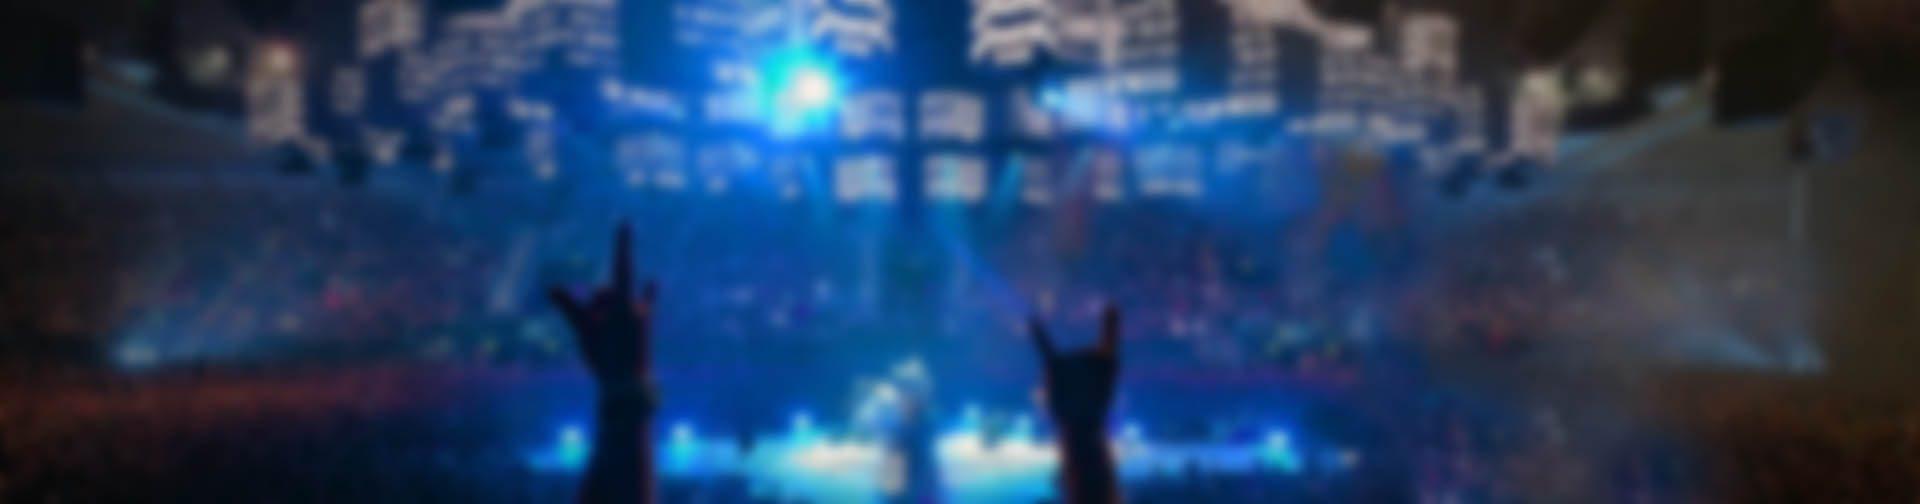 Kontserdireis: Metallica